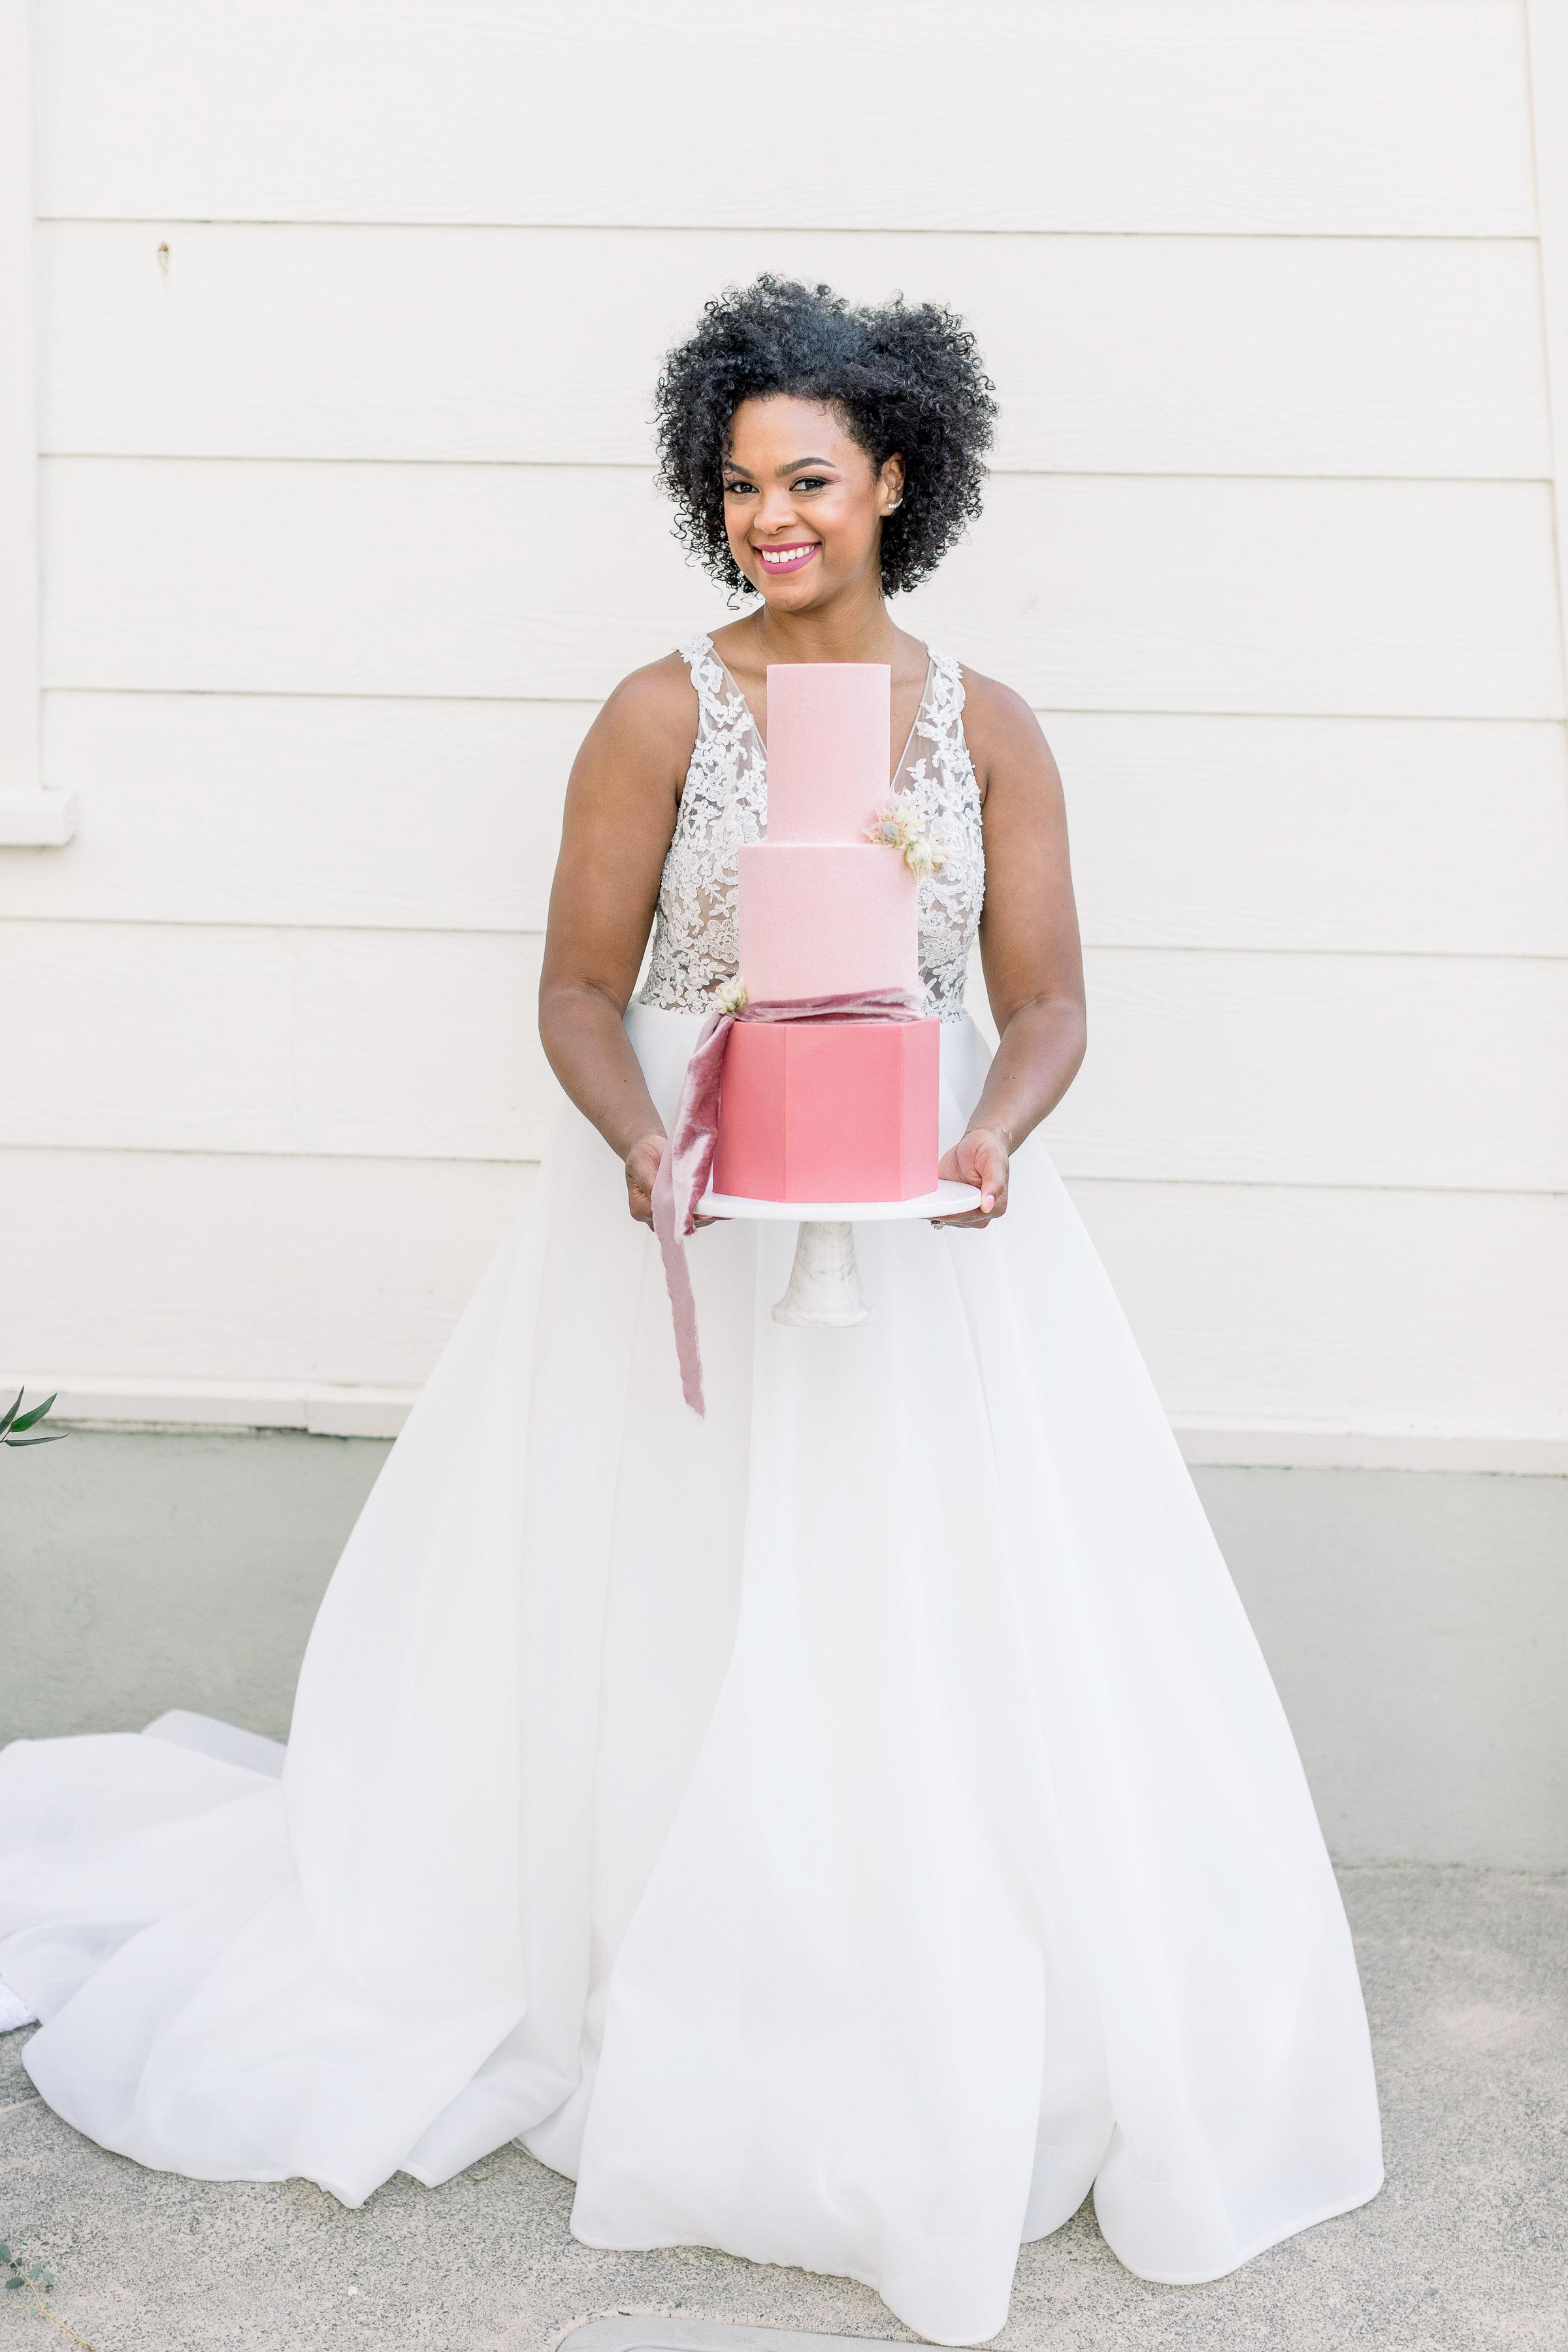 Pink Wedding | Feminine Wedding | Spring Wedding | Pink Wedding Flowers | Wedding Cake | Pink Wedding Cake | Fondant Wedding Cake | Pink Layer Cake | Unique Wedding Cake